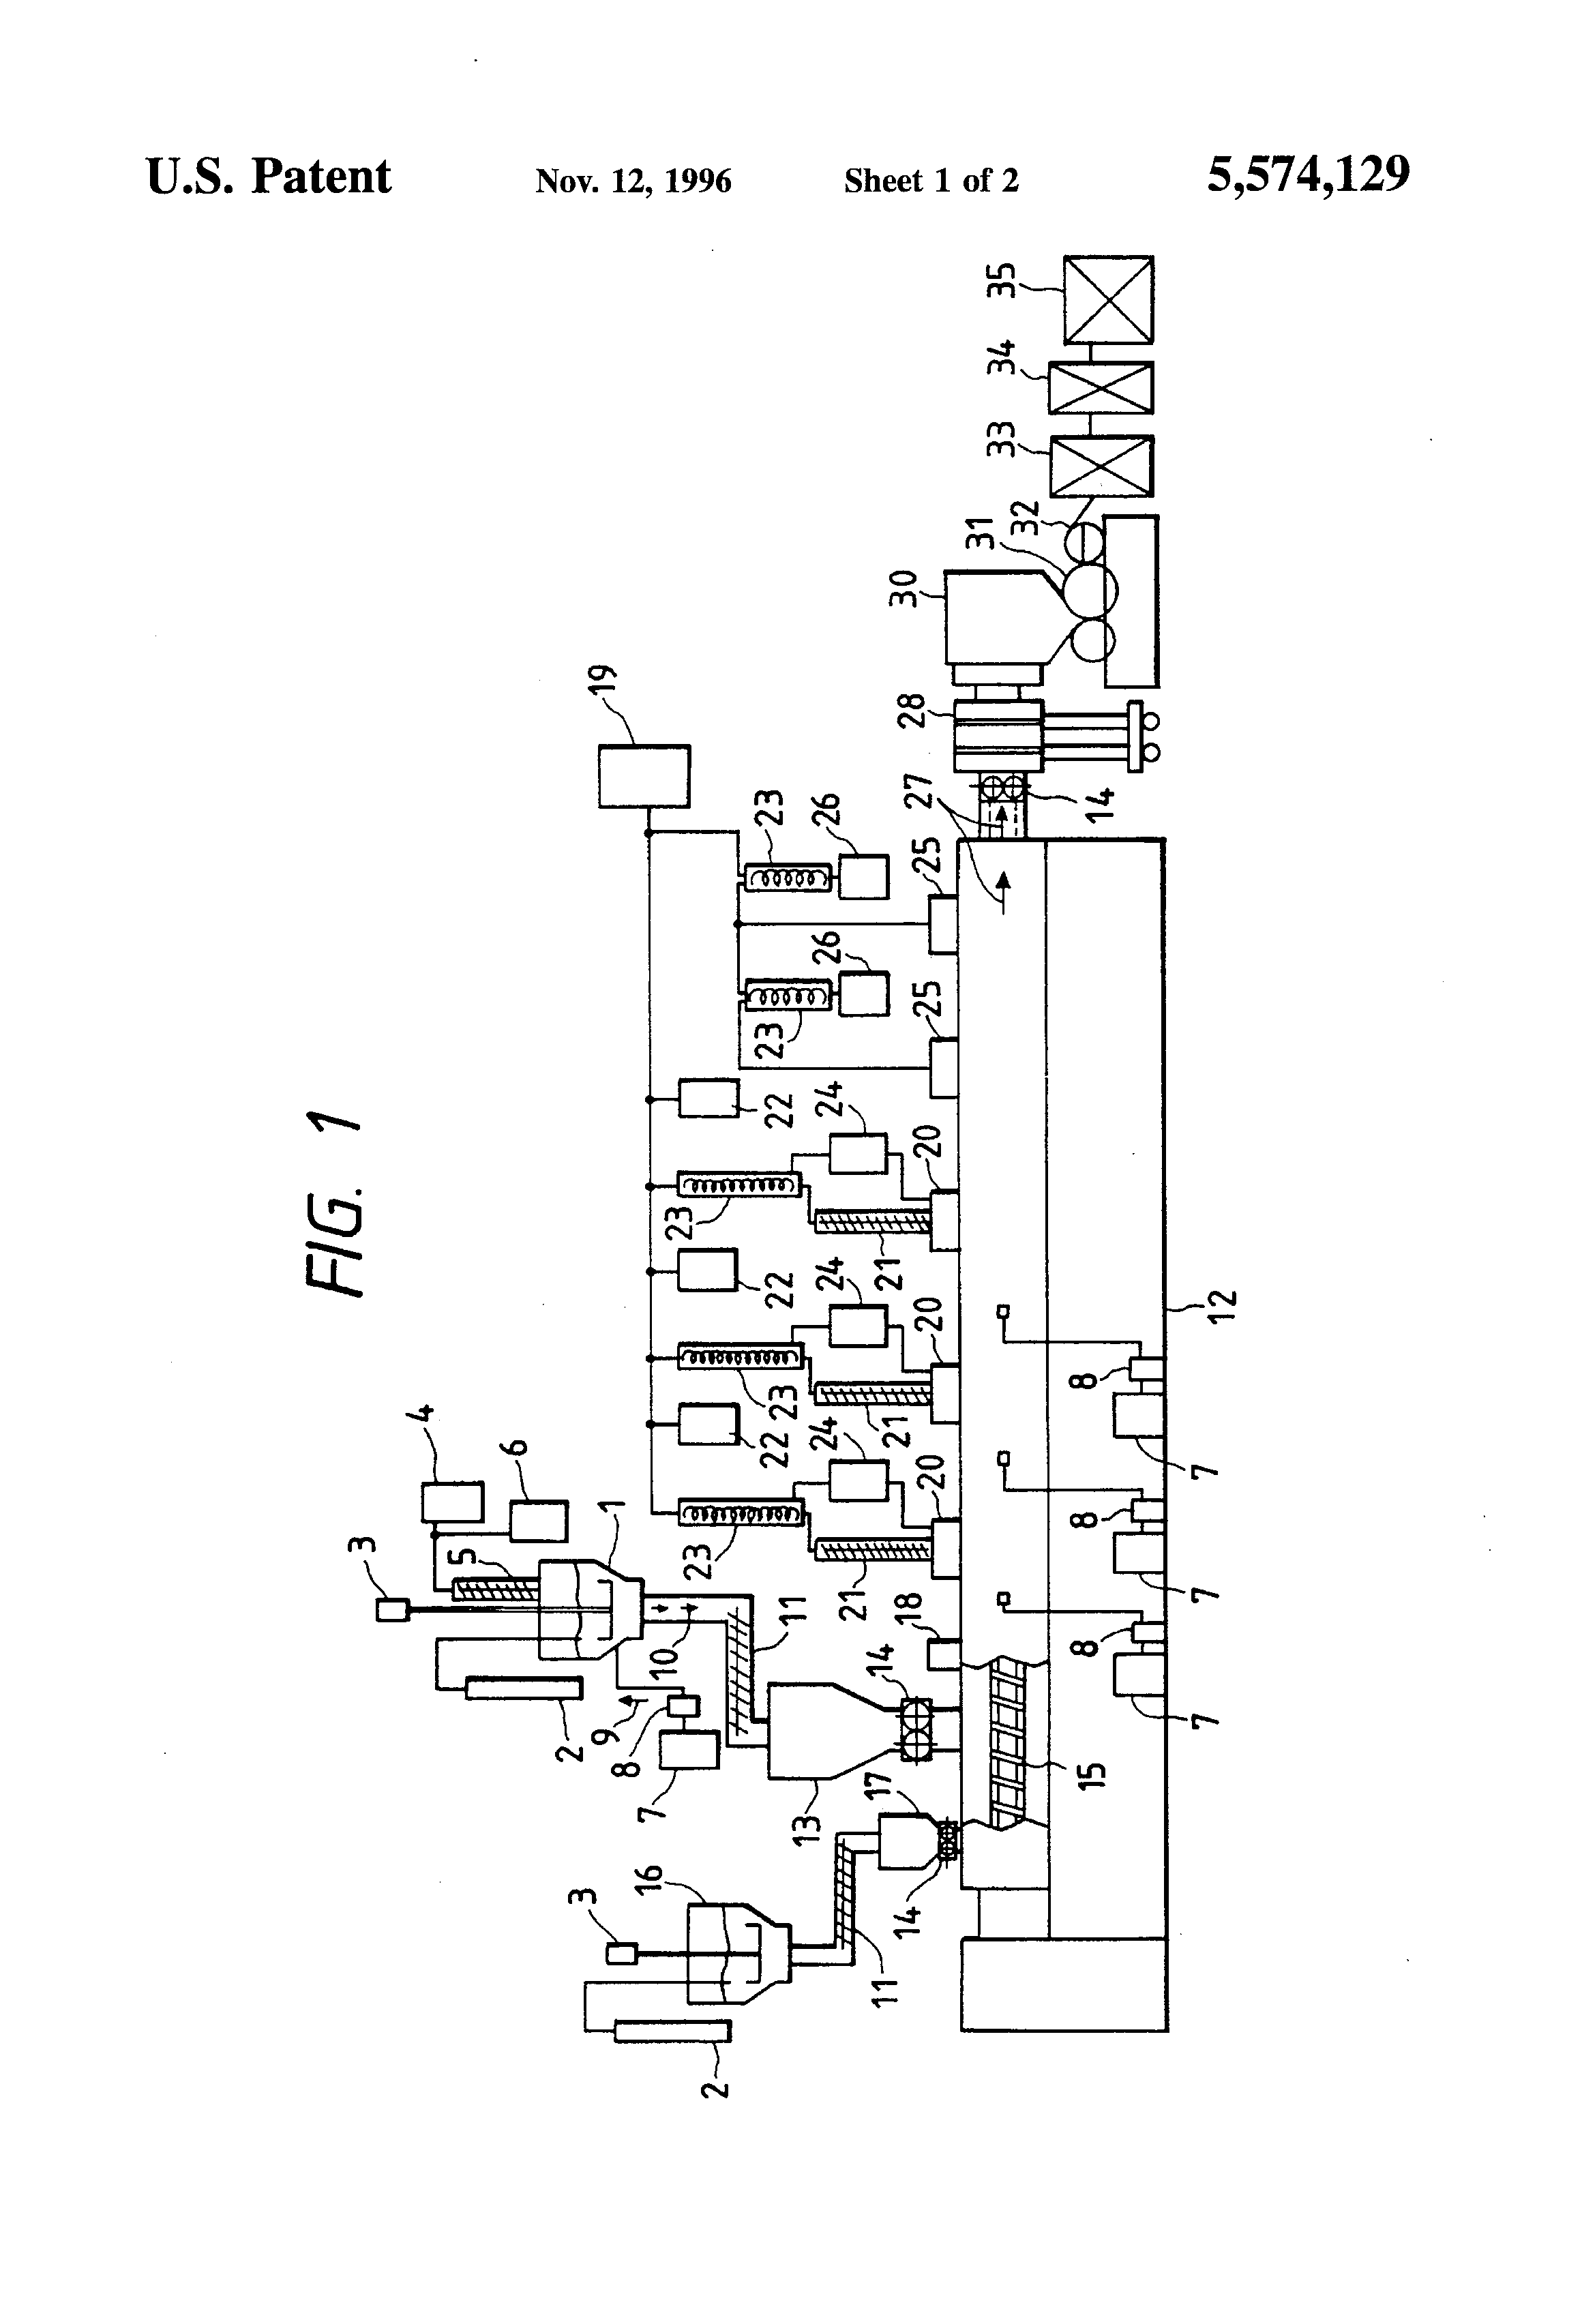 rg 6336 2004 hyundai santa fe engine diagram on 6 0l ford motor parts diagram wiring diagram aeocy wned ponge romet dness xortanet emba mohammedshrine librar wiring 101